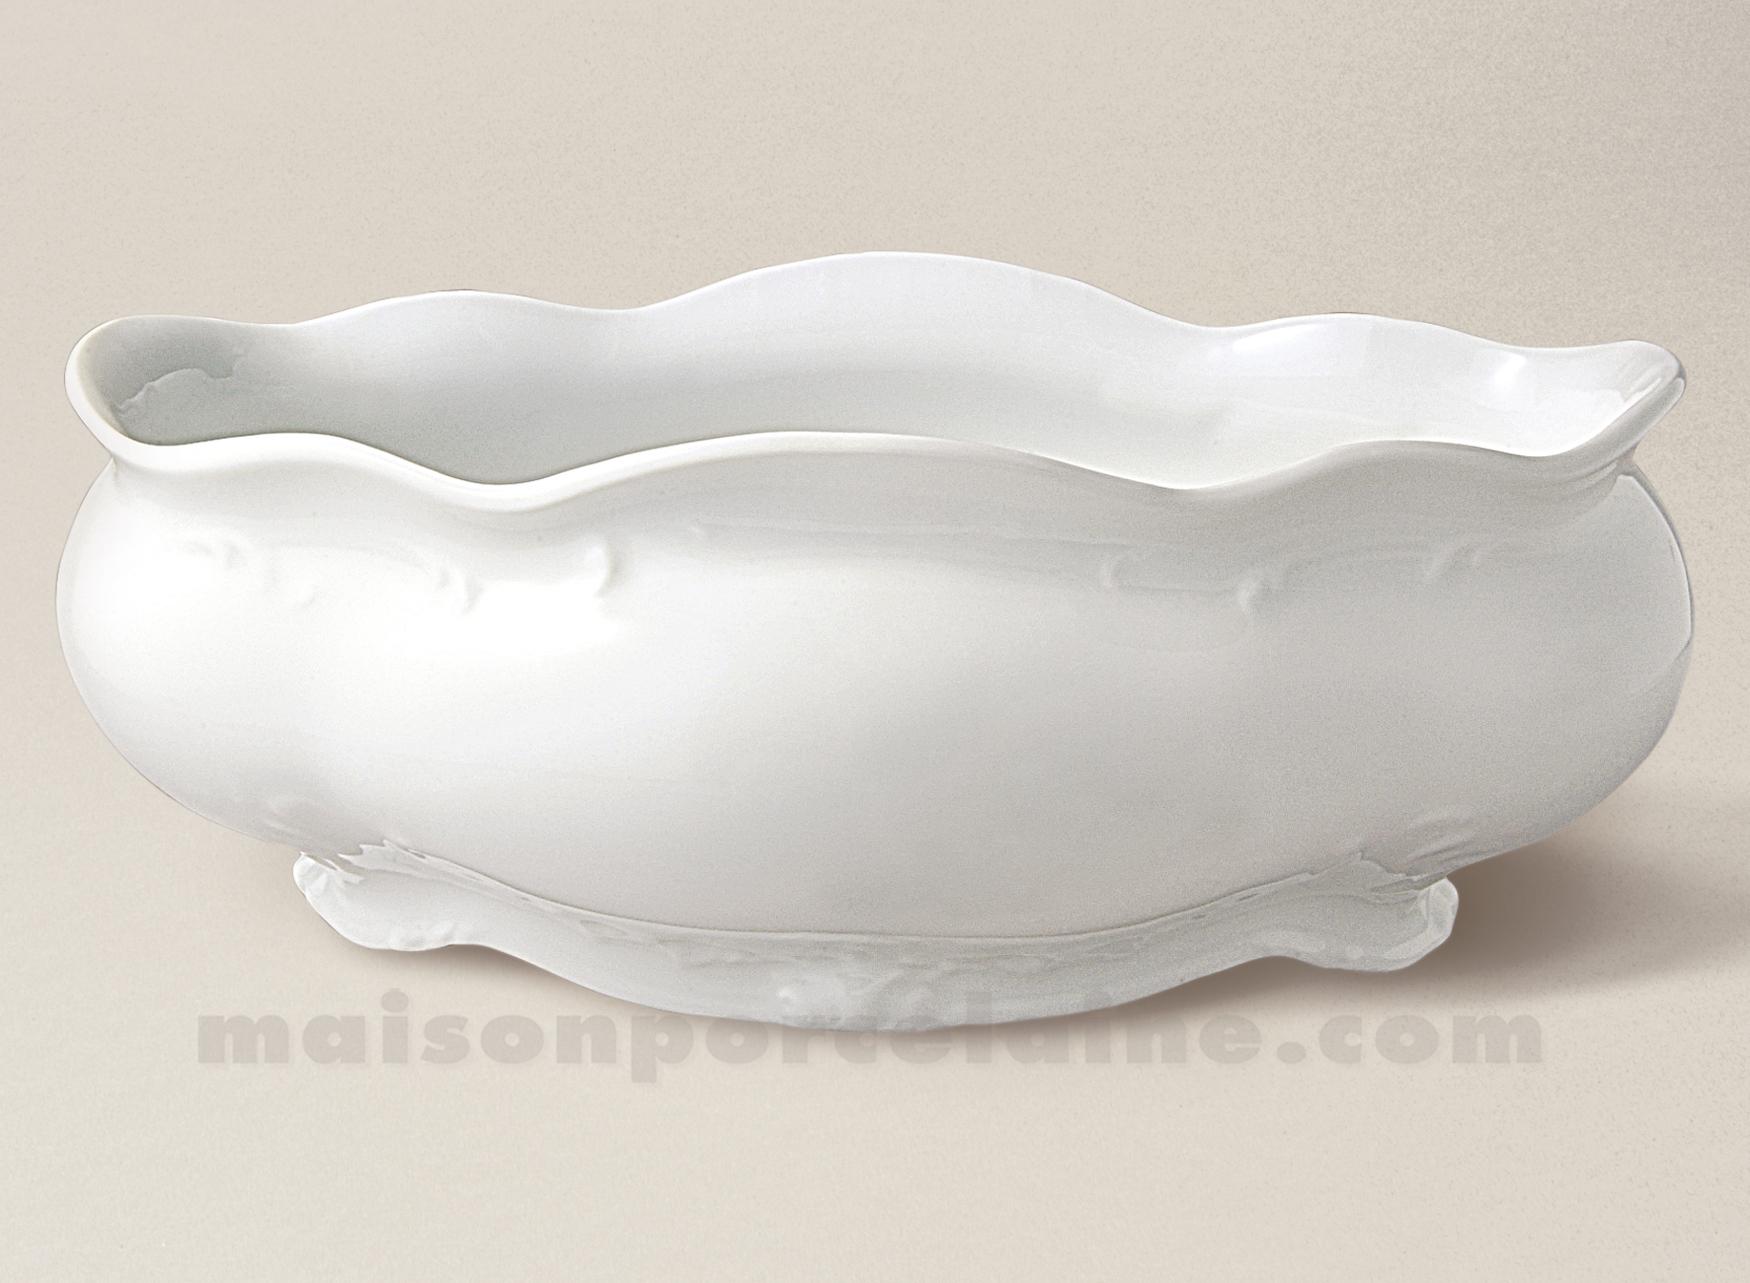 Jardiniere limoges porcelaine blanche william guerin x 32x22 maison de la p - La porcelaine blanche ...